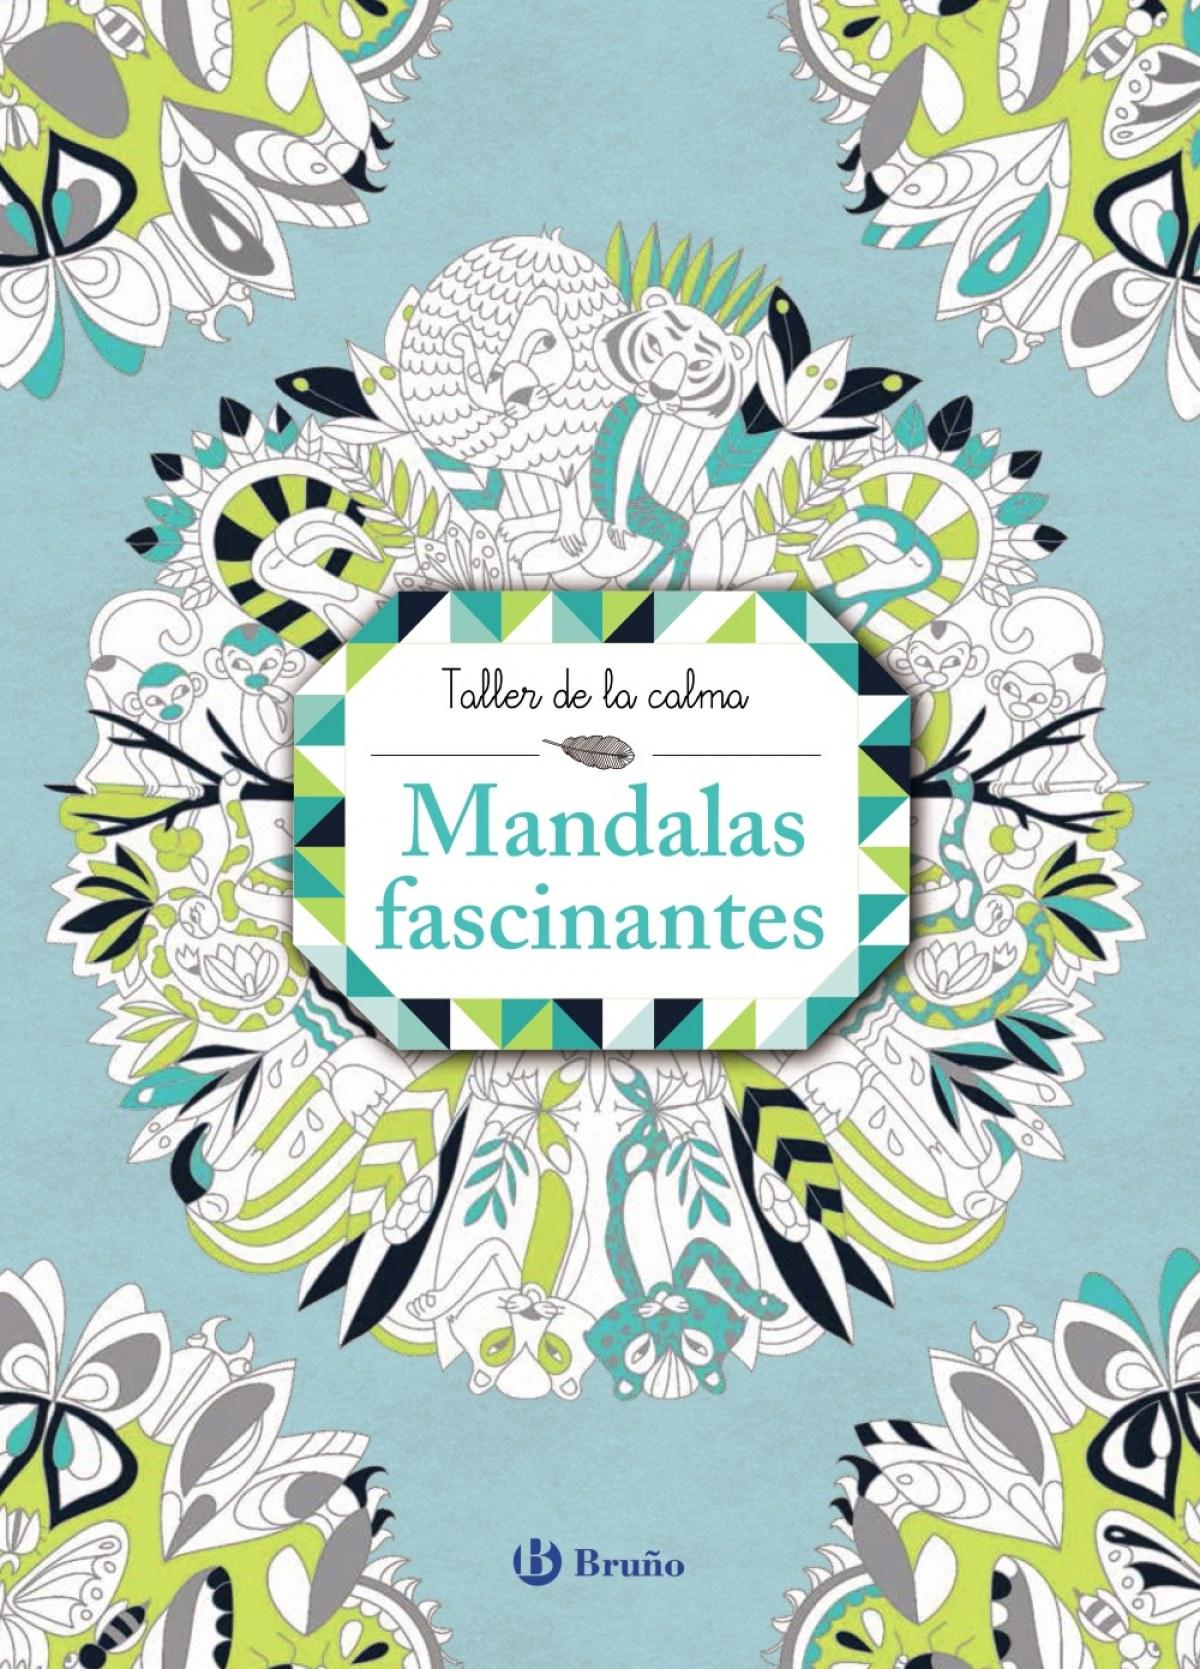 MANDALAS FASCINANTES 9788469620854